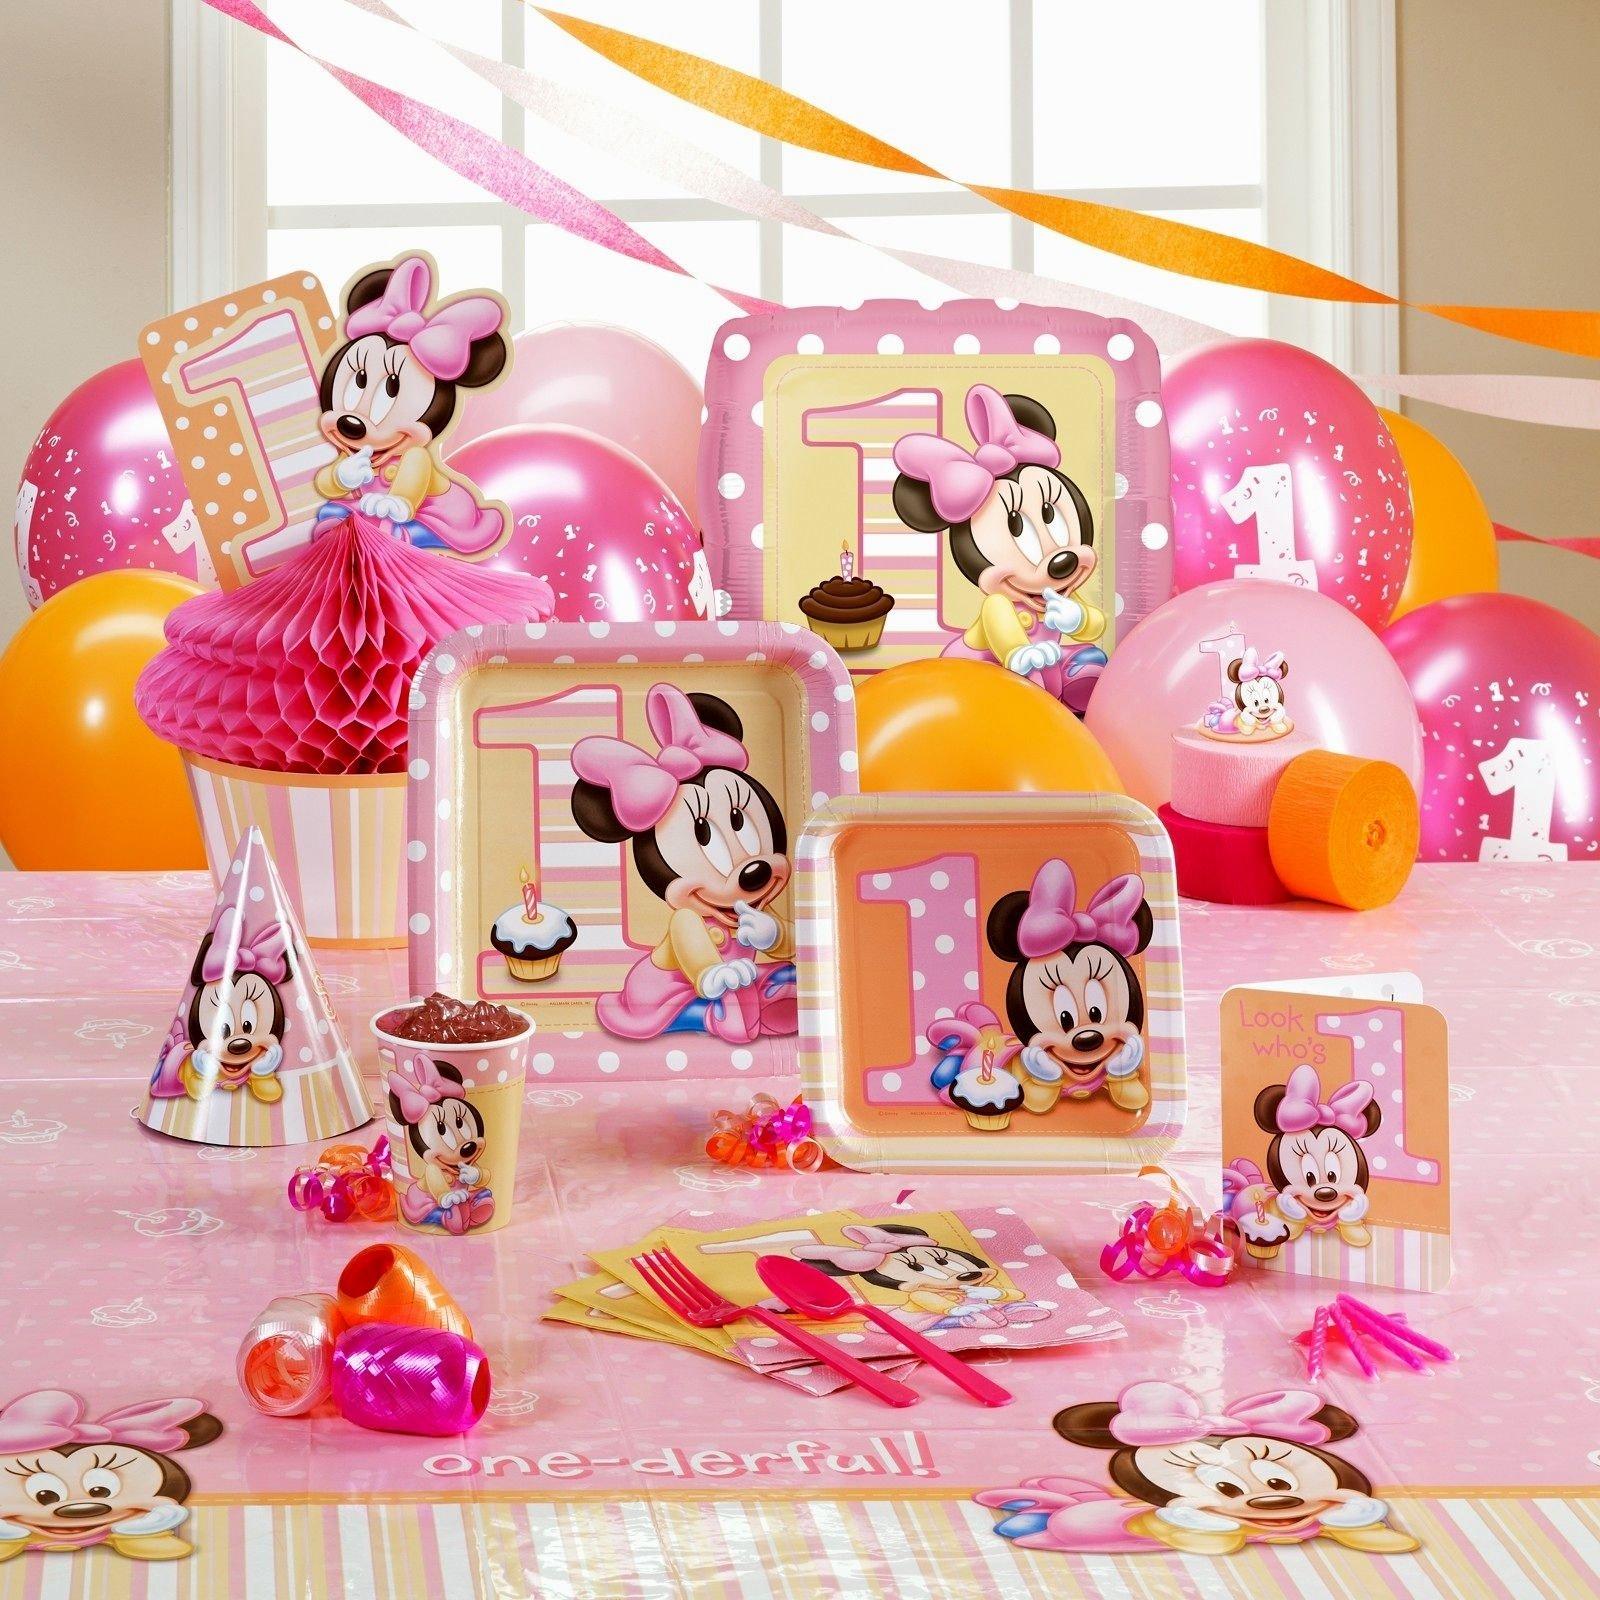 10 Attractive Baby Girl 1St Birthday Ideas baby girl first birthday party ideas decorating of party 2 2020